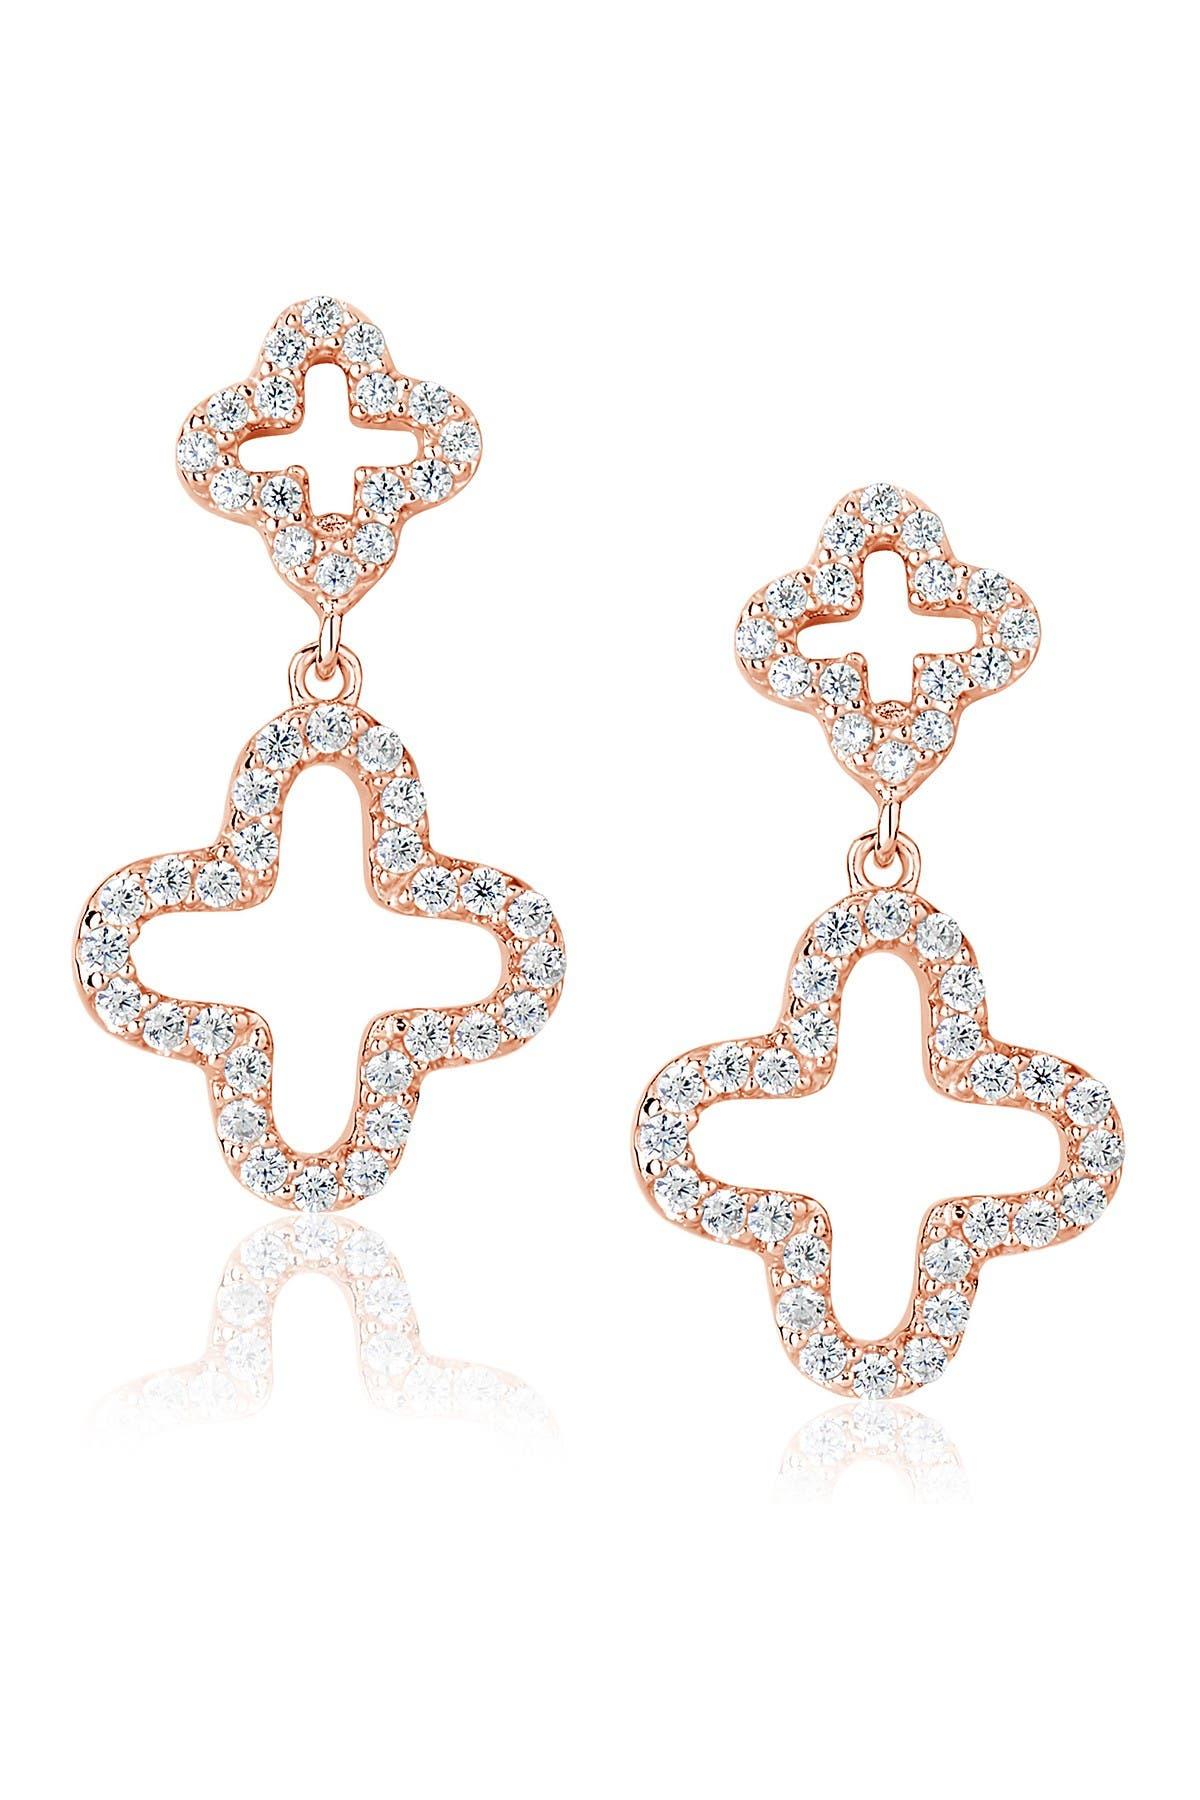 Image of Suzy Levian CZ Clover Drop Earrings